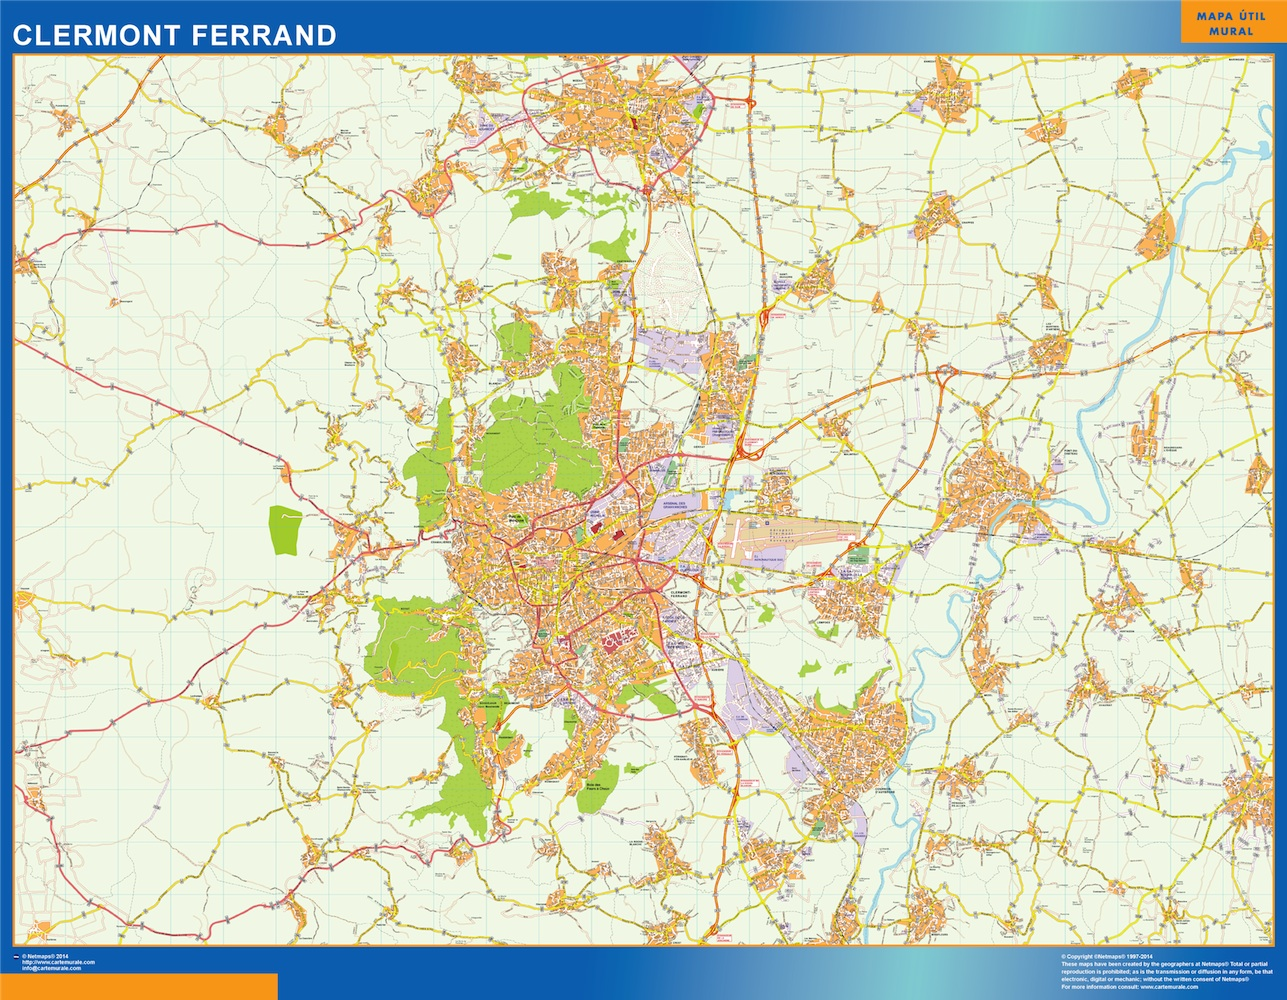 Mapa Clermont Ferrand en Francia plastificado gigante